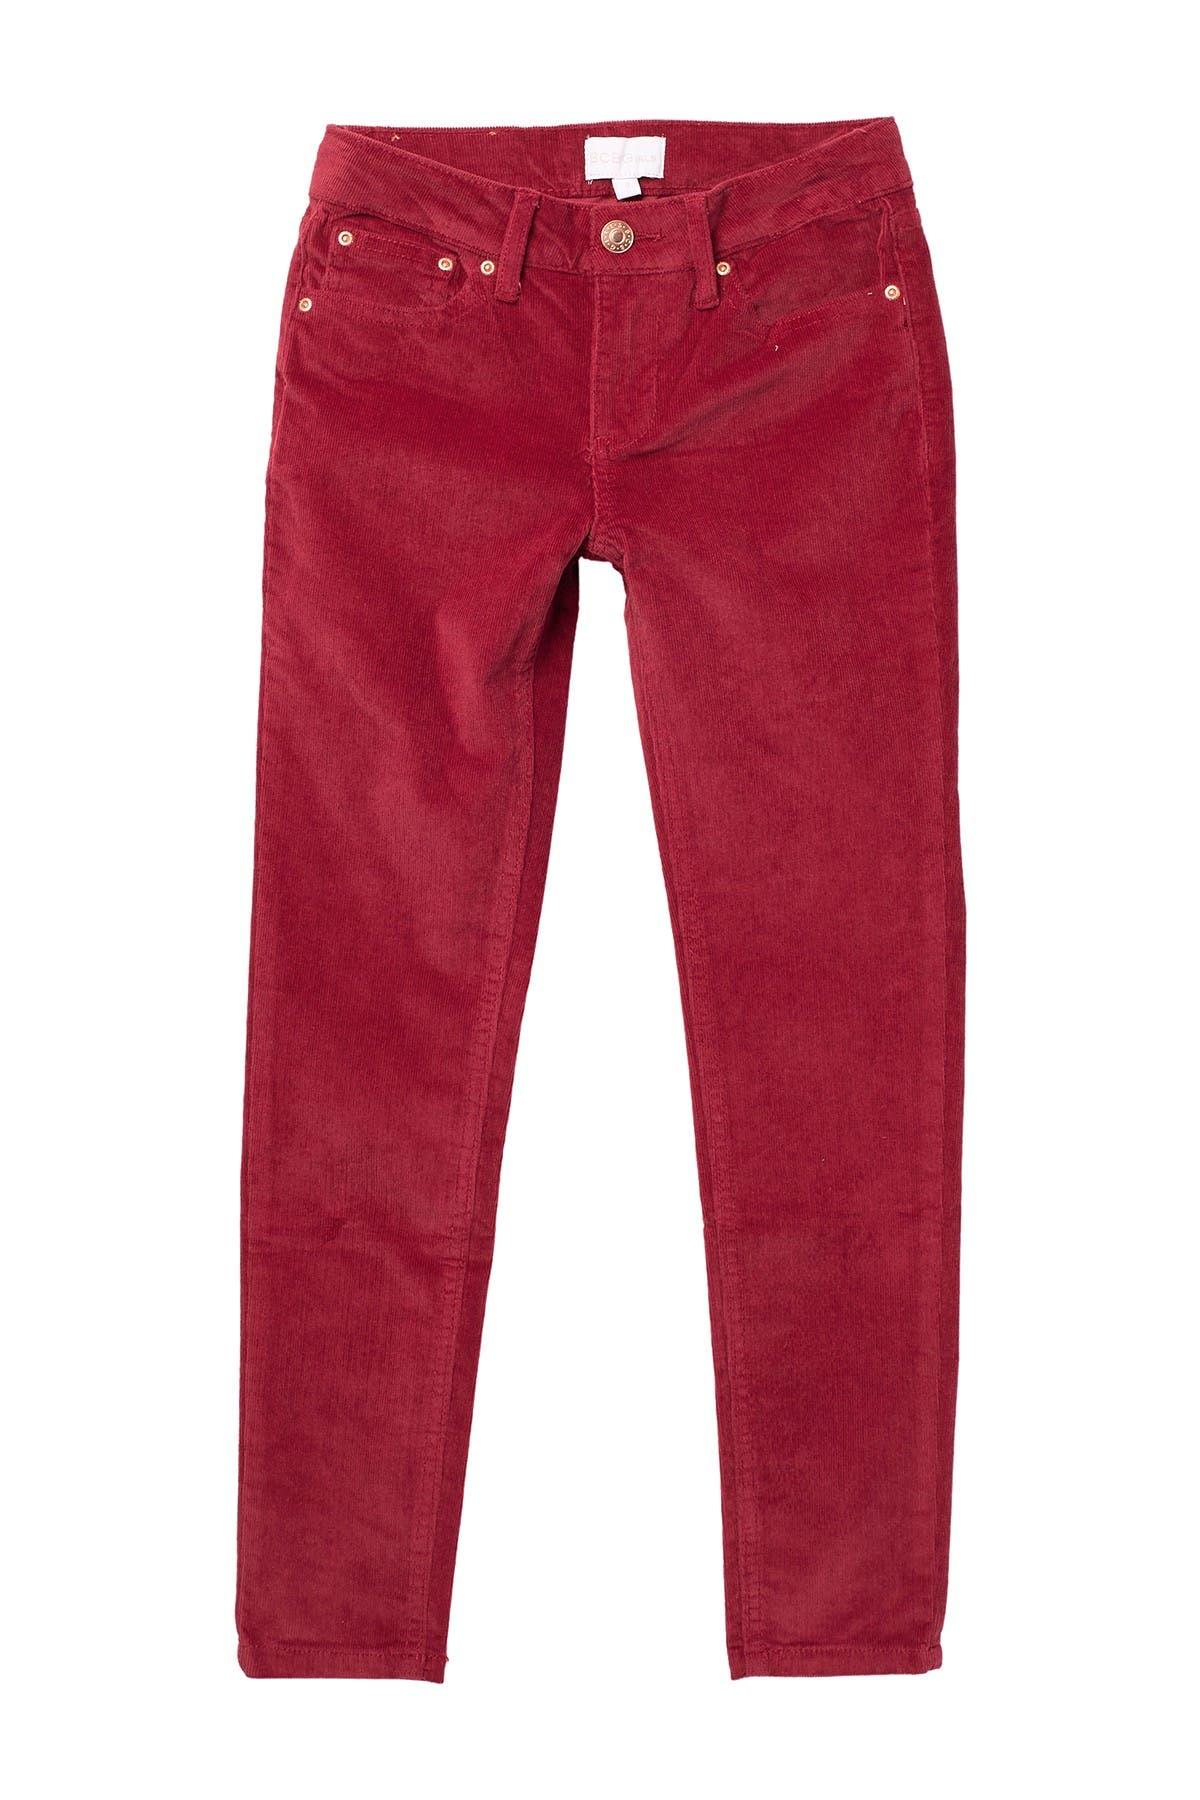 Image of BCBGirls Corduroy Pants